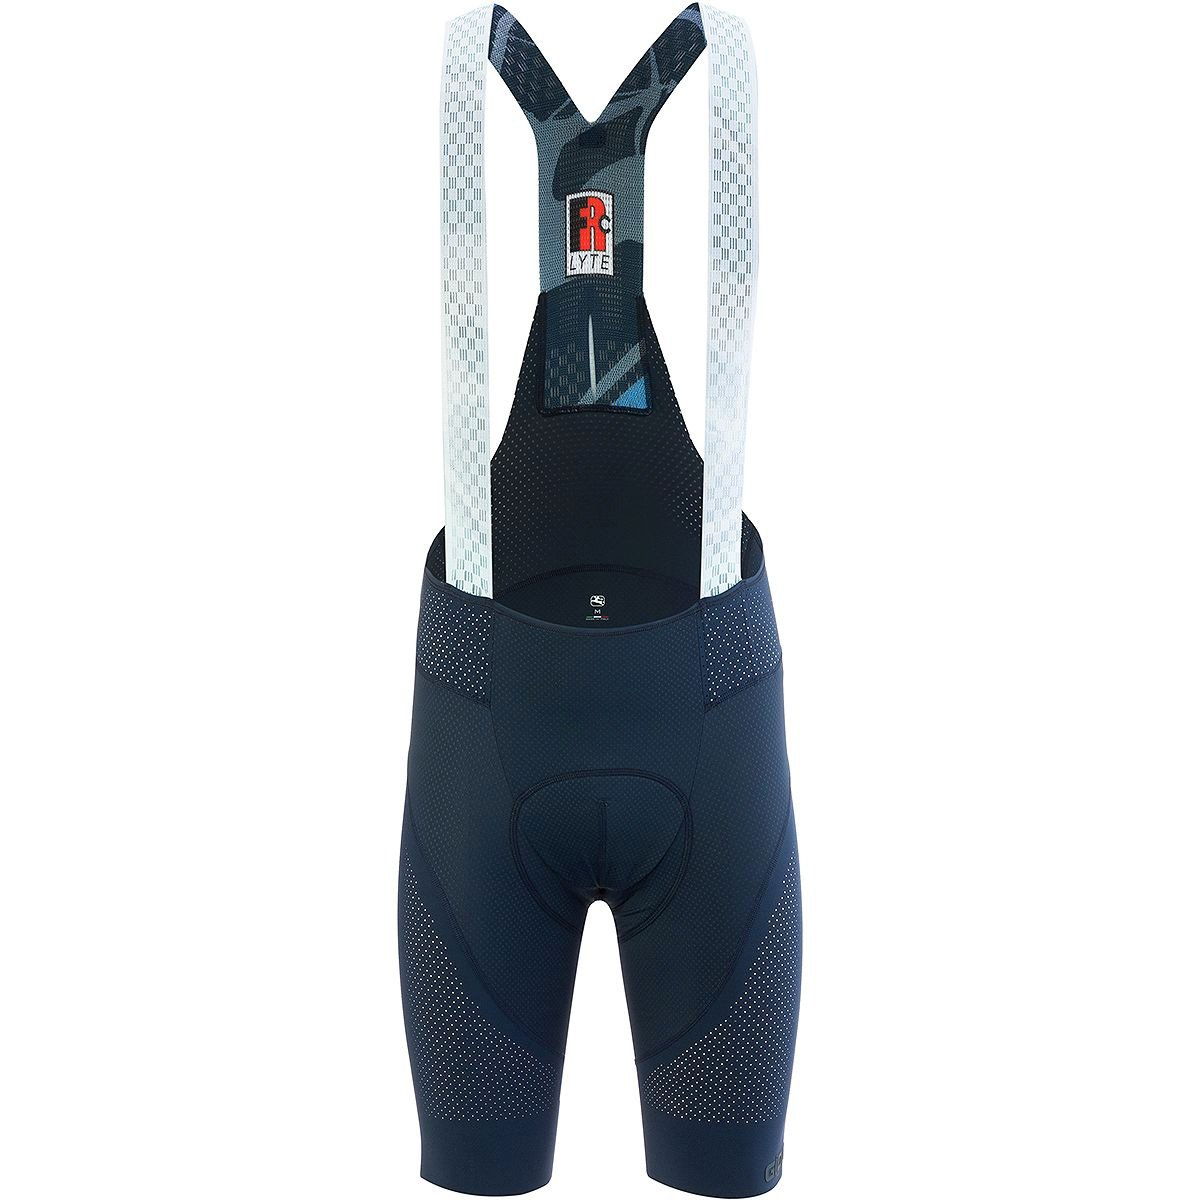 Giordana fr-c Pro Lyte Bib Short – Men 's B07CBZNKPH X-Large ネイビー ネイビー X-Large